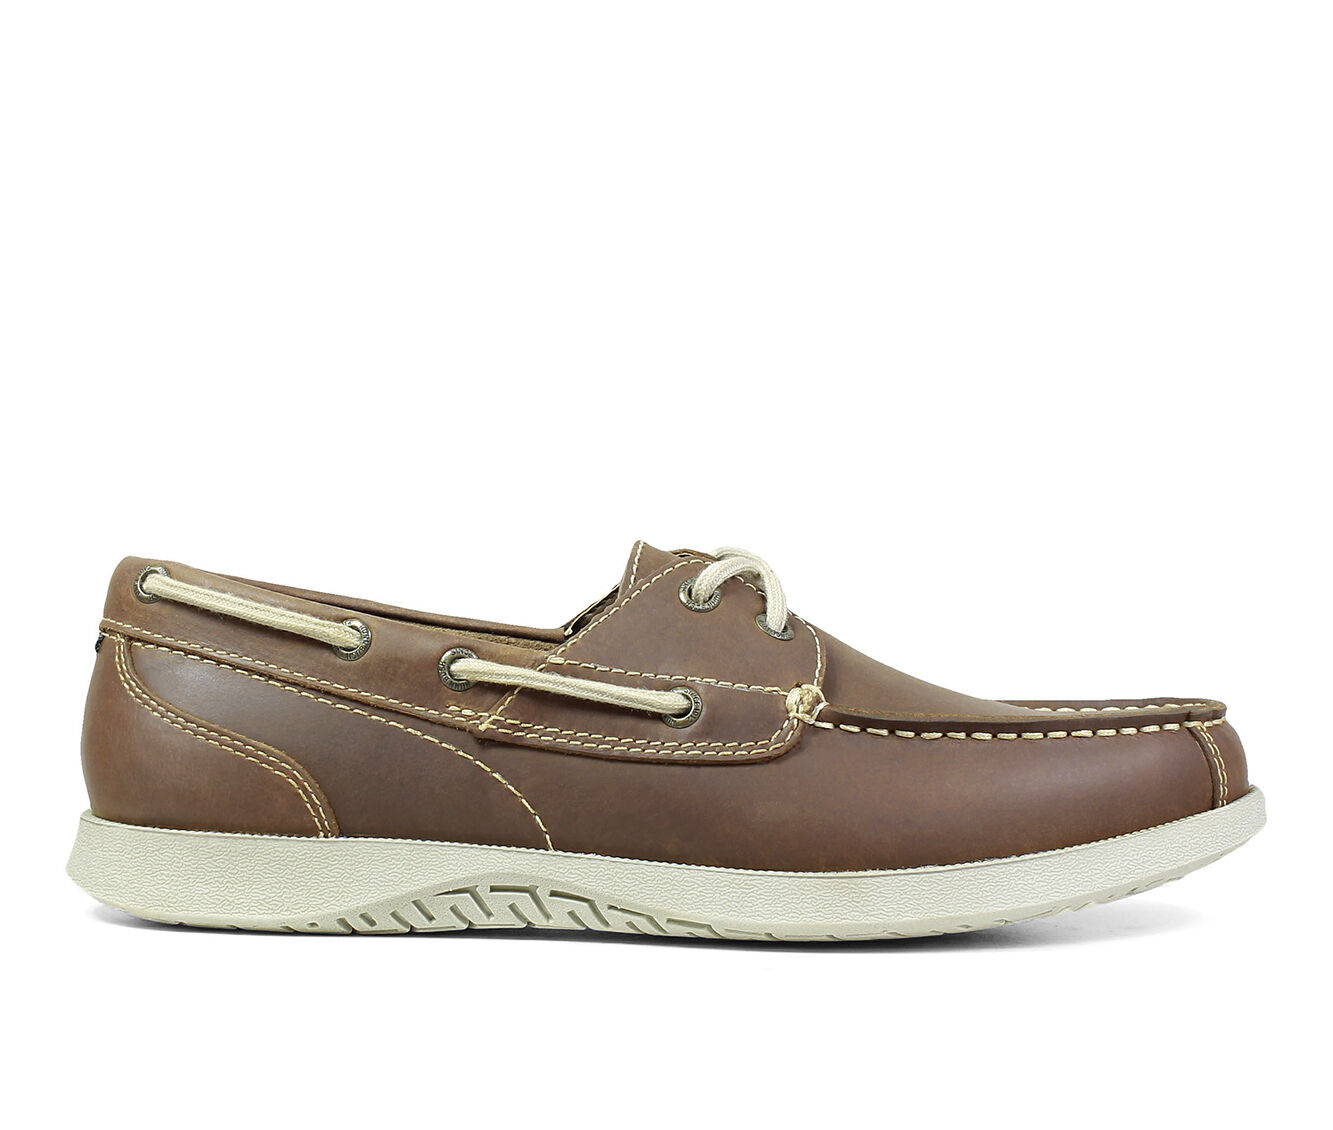 uk shoes_kd1197